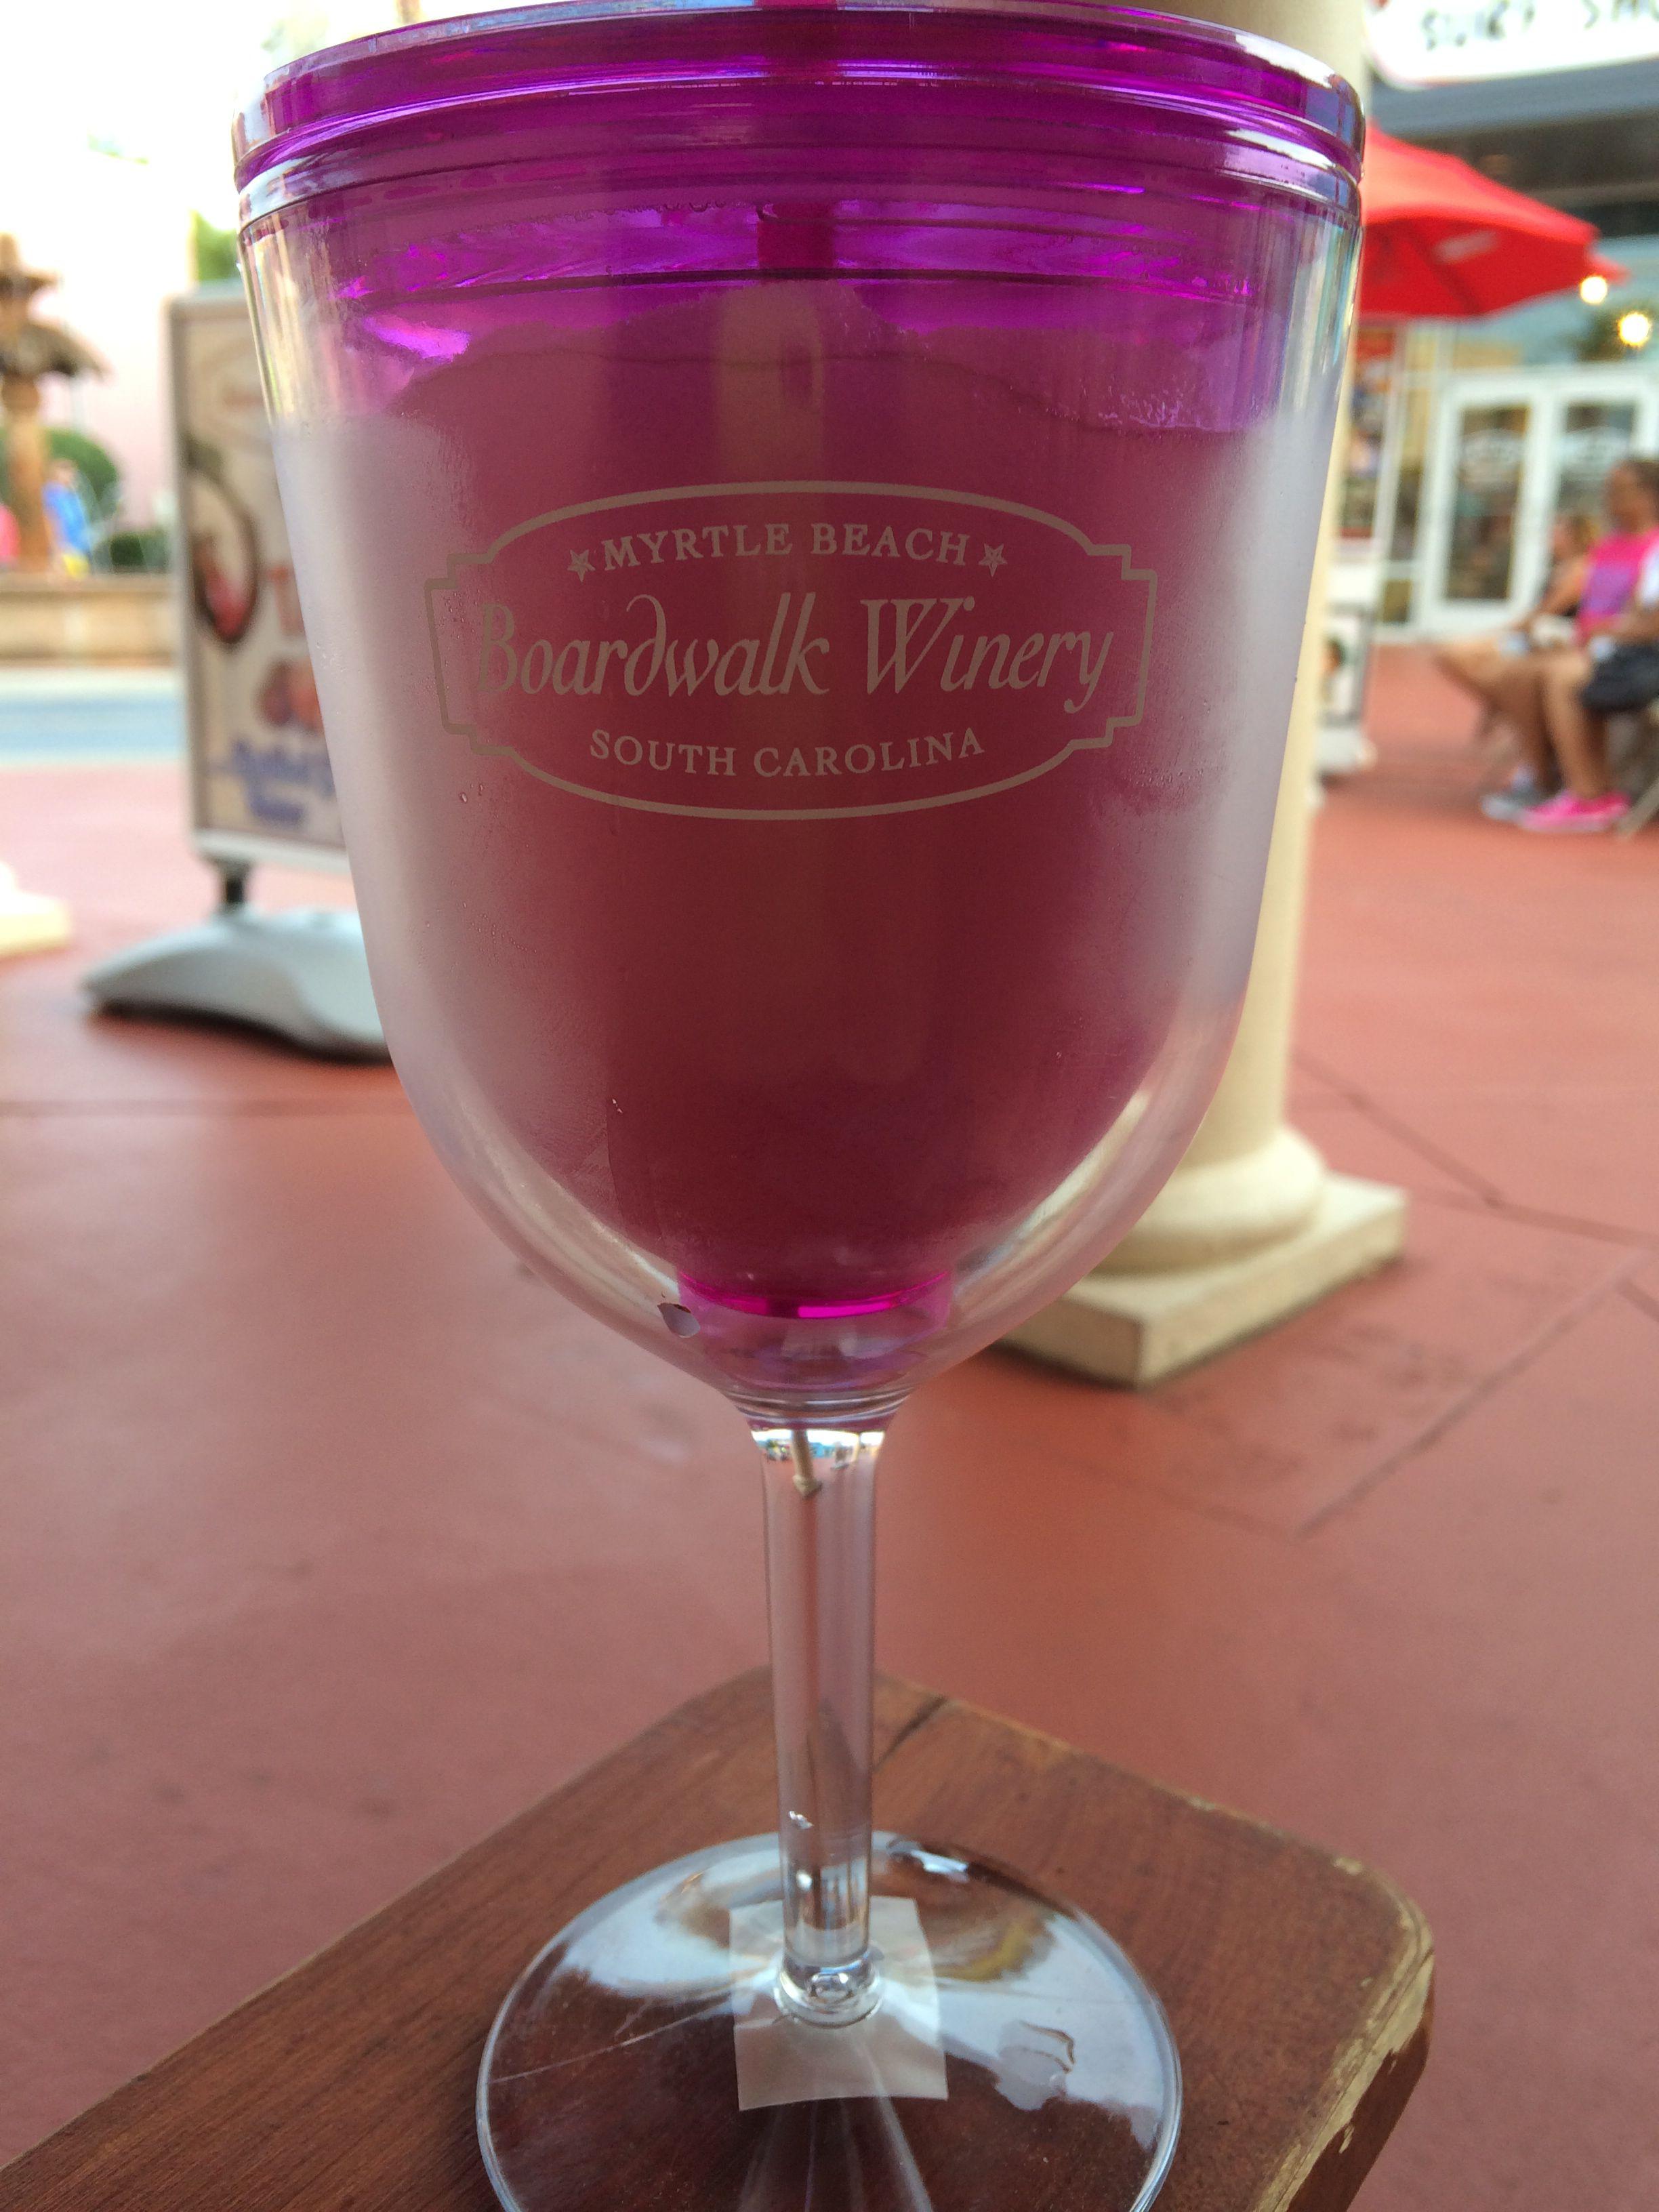 Peach Wine Slushie From Boardwalk Winery At Broadway At The Beach Myrtle Beach Sc Myrtle Beach Vacation Broadway At The Beach Myrtle Beach